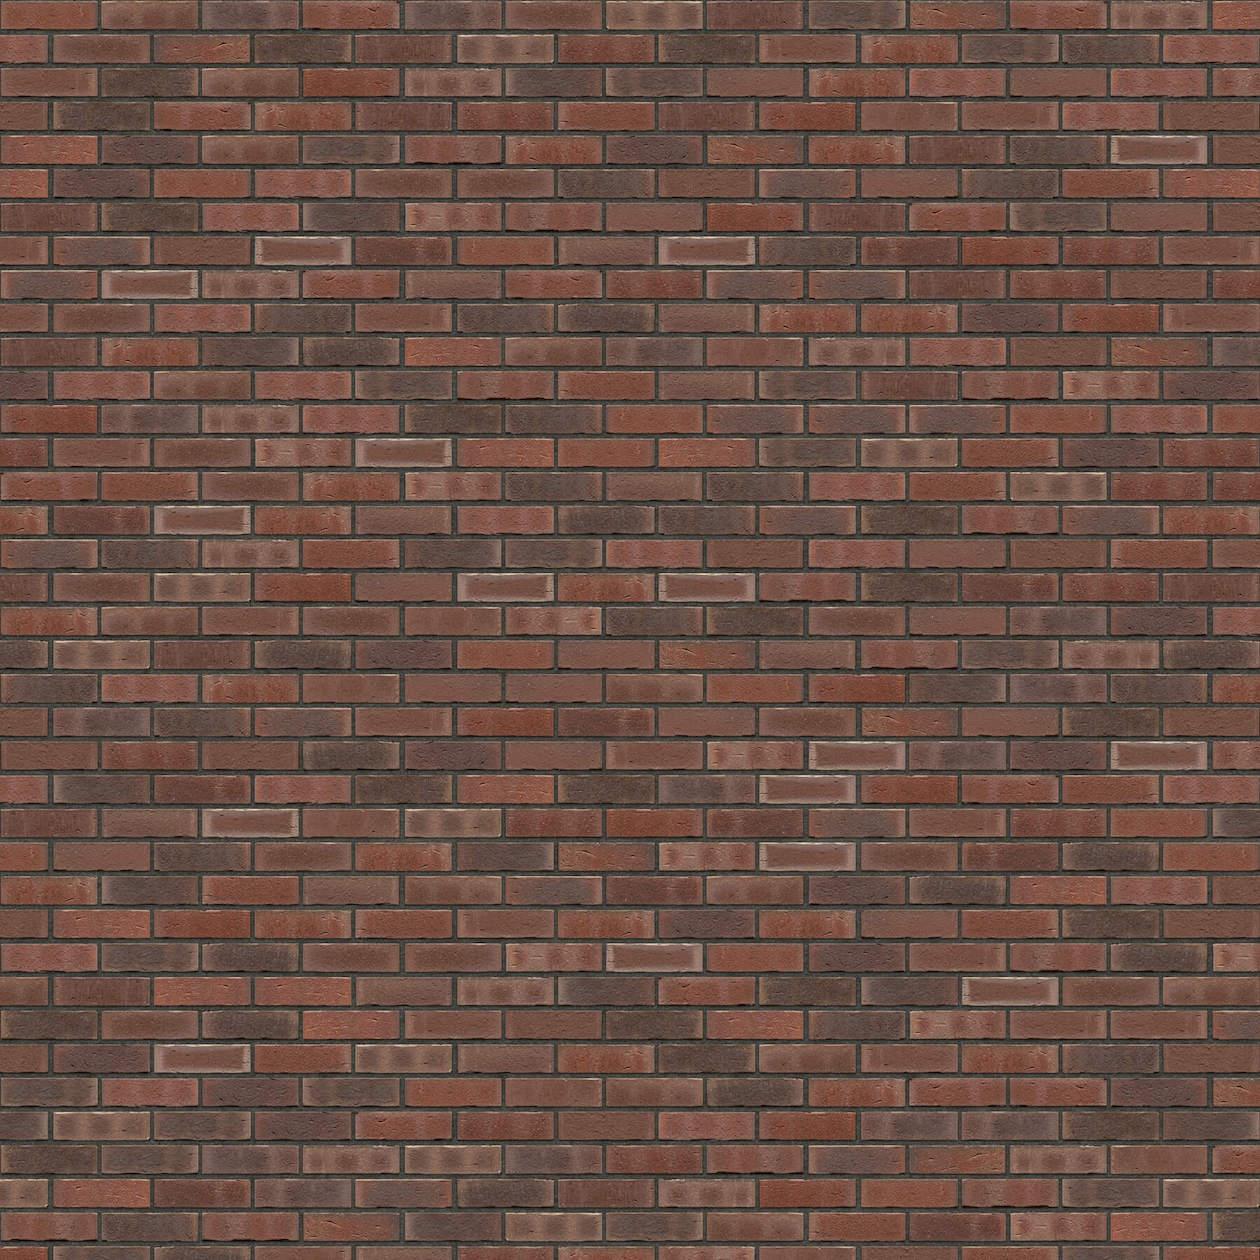 Puna-cigla-FeldHaus-Klinker-brick-house-nf-k-748-Antracit Fuga